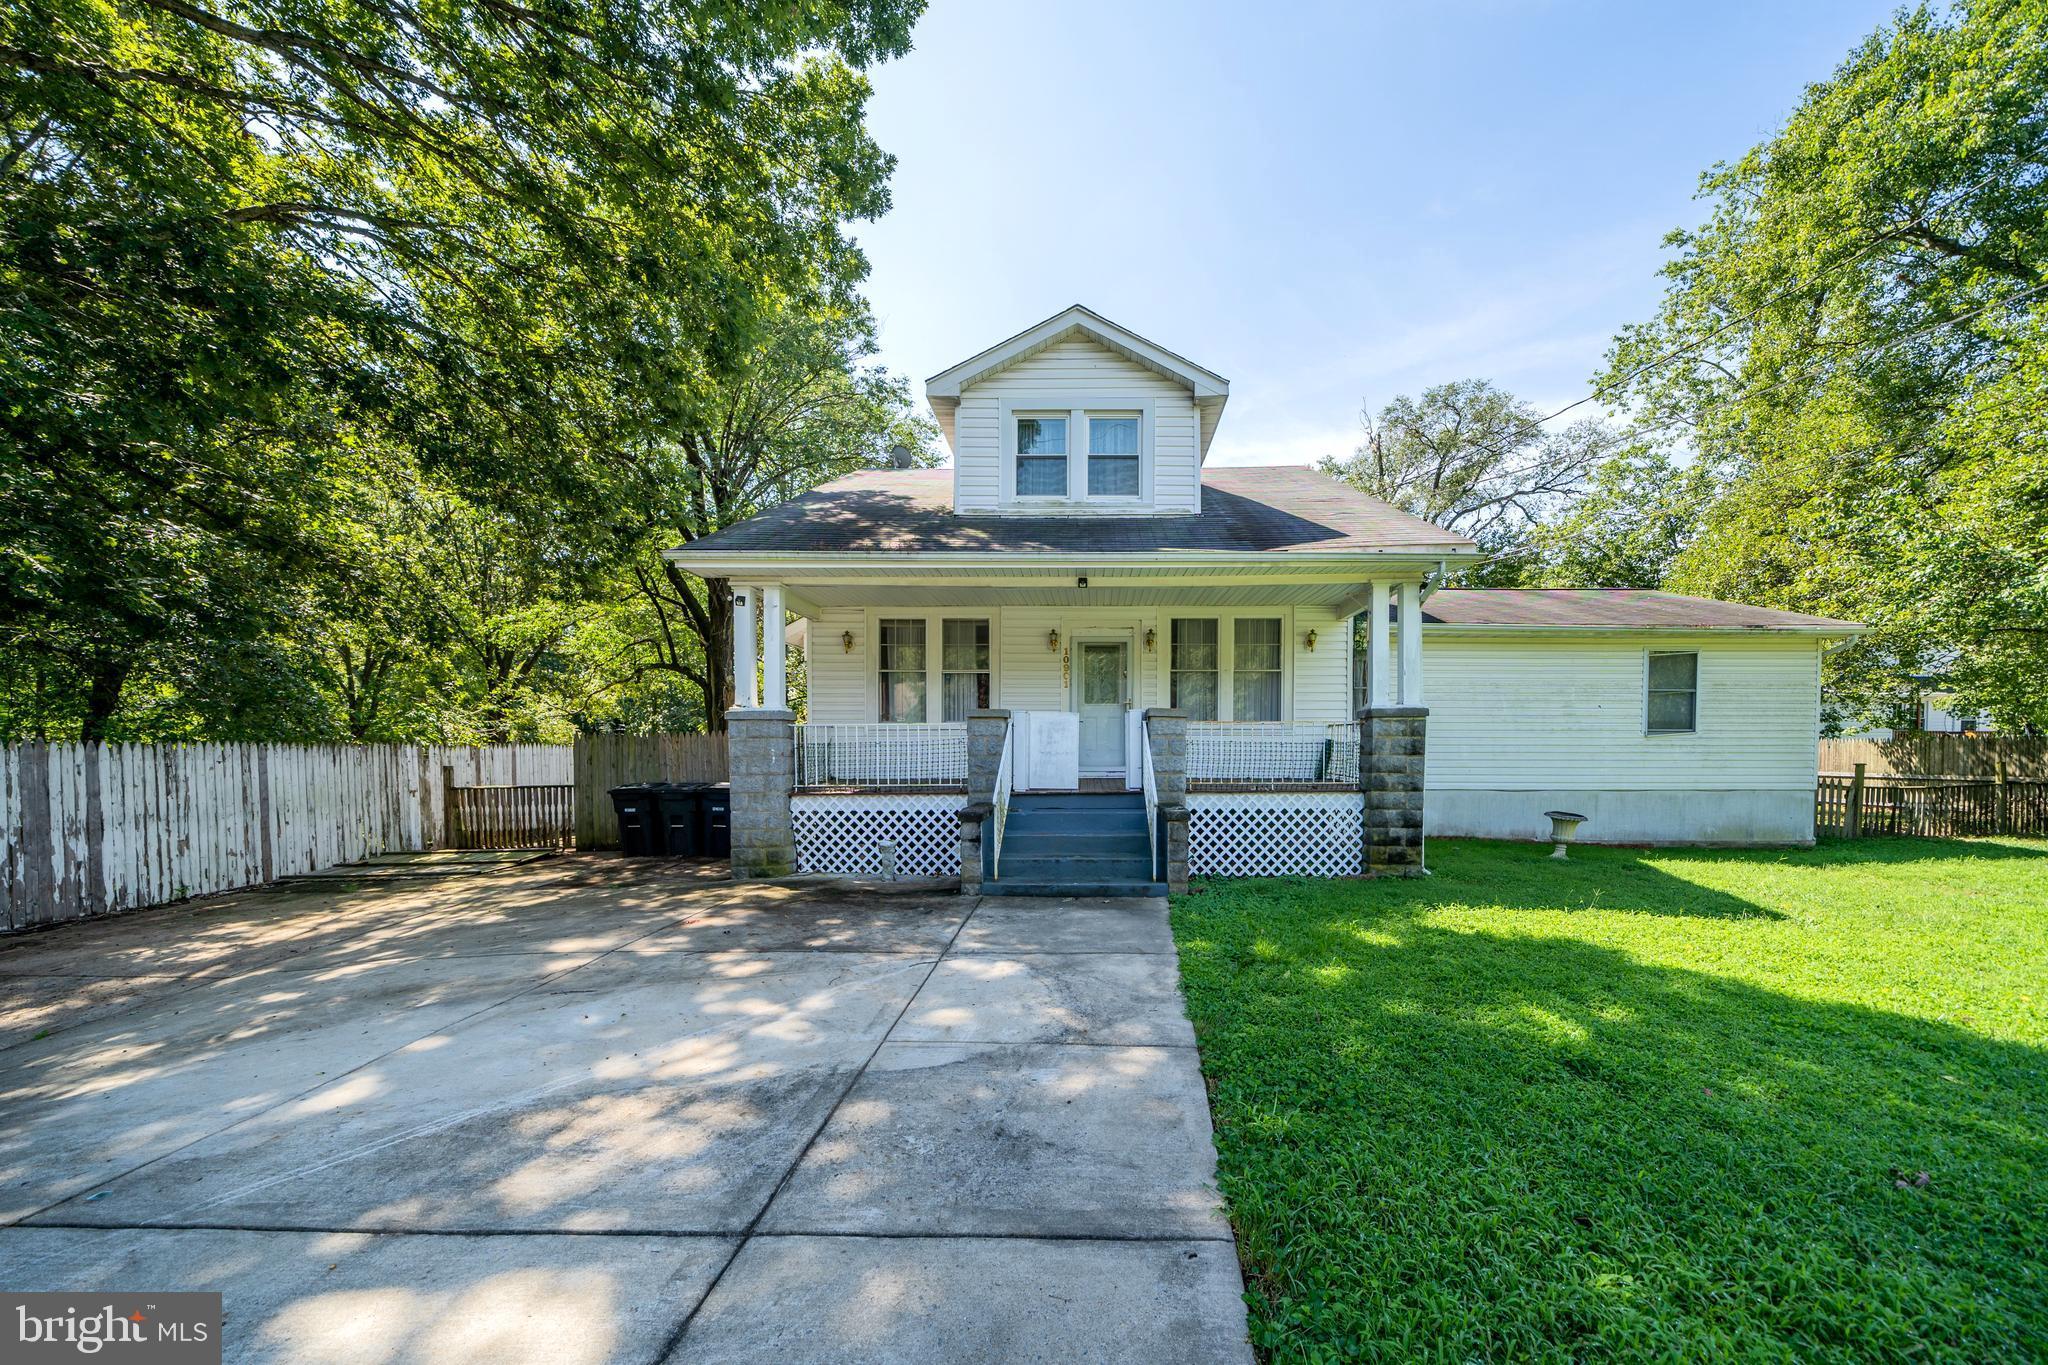 10901 Prospect Hill Rd, Glenn Dale, MD, 20769